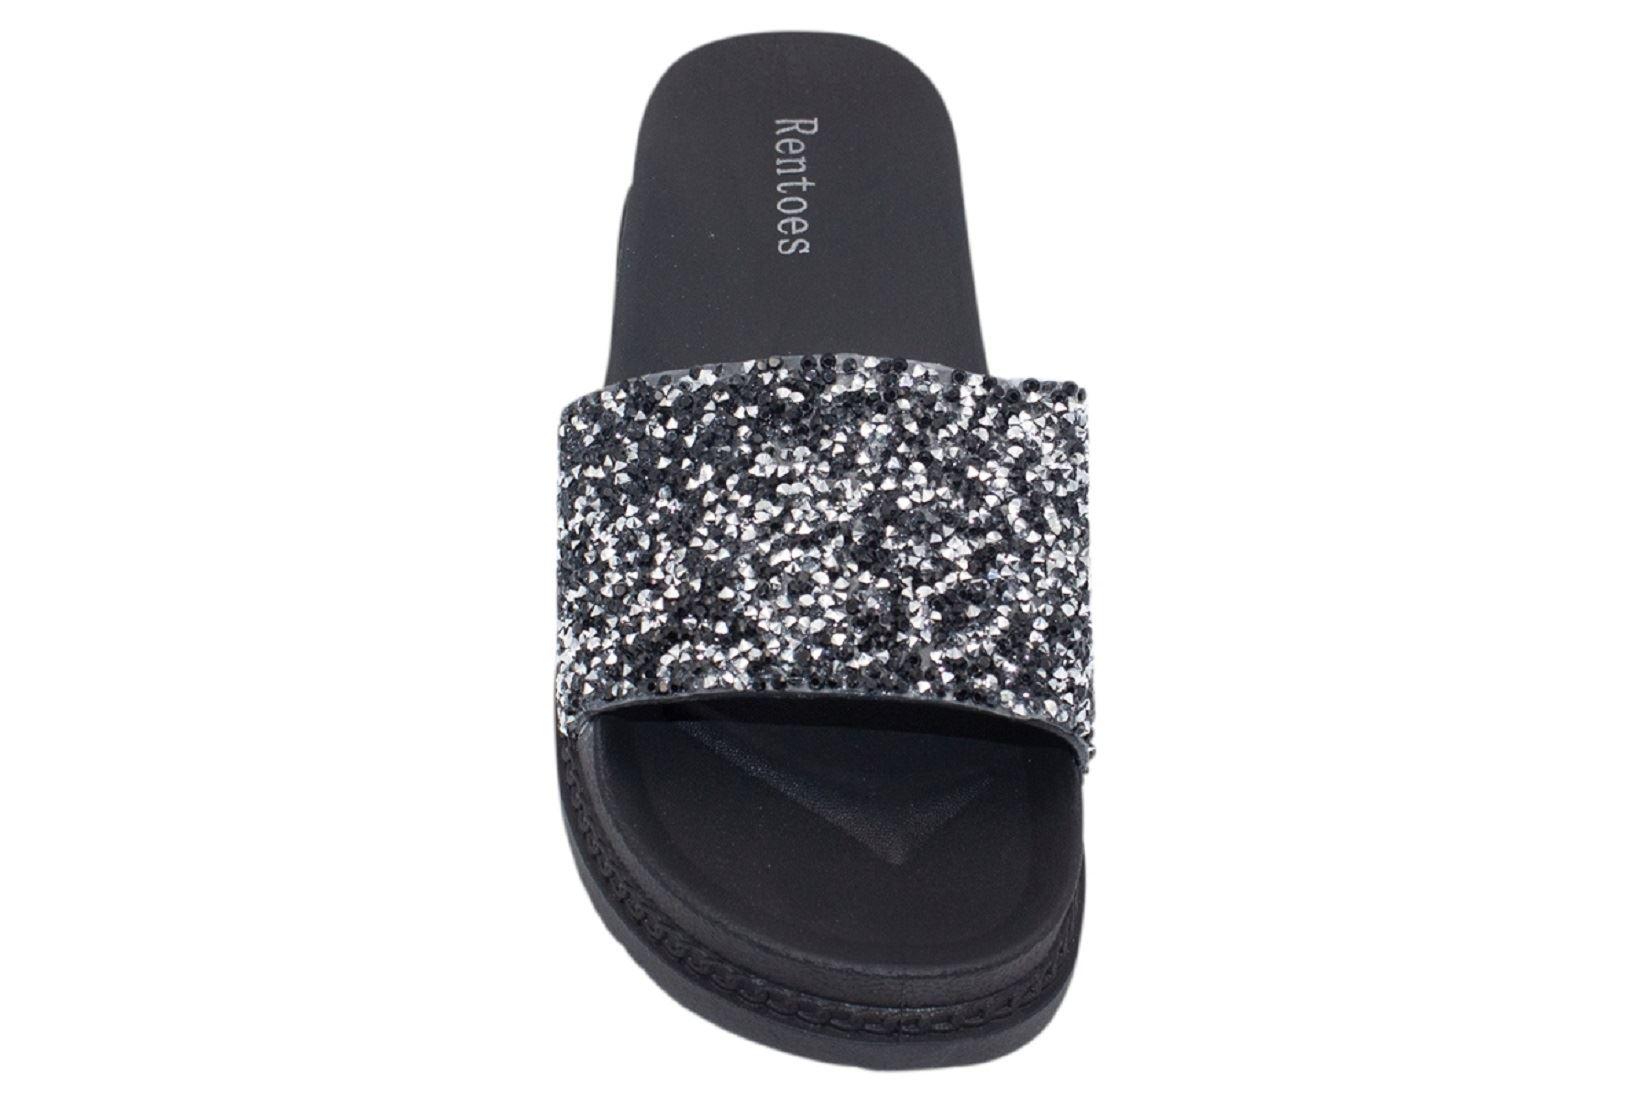 Womens-Sliders-Casual-Slippers-Mules-Ladies-Diamante-Flip-Flop-Sandals-Shoes thumbnail 83